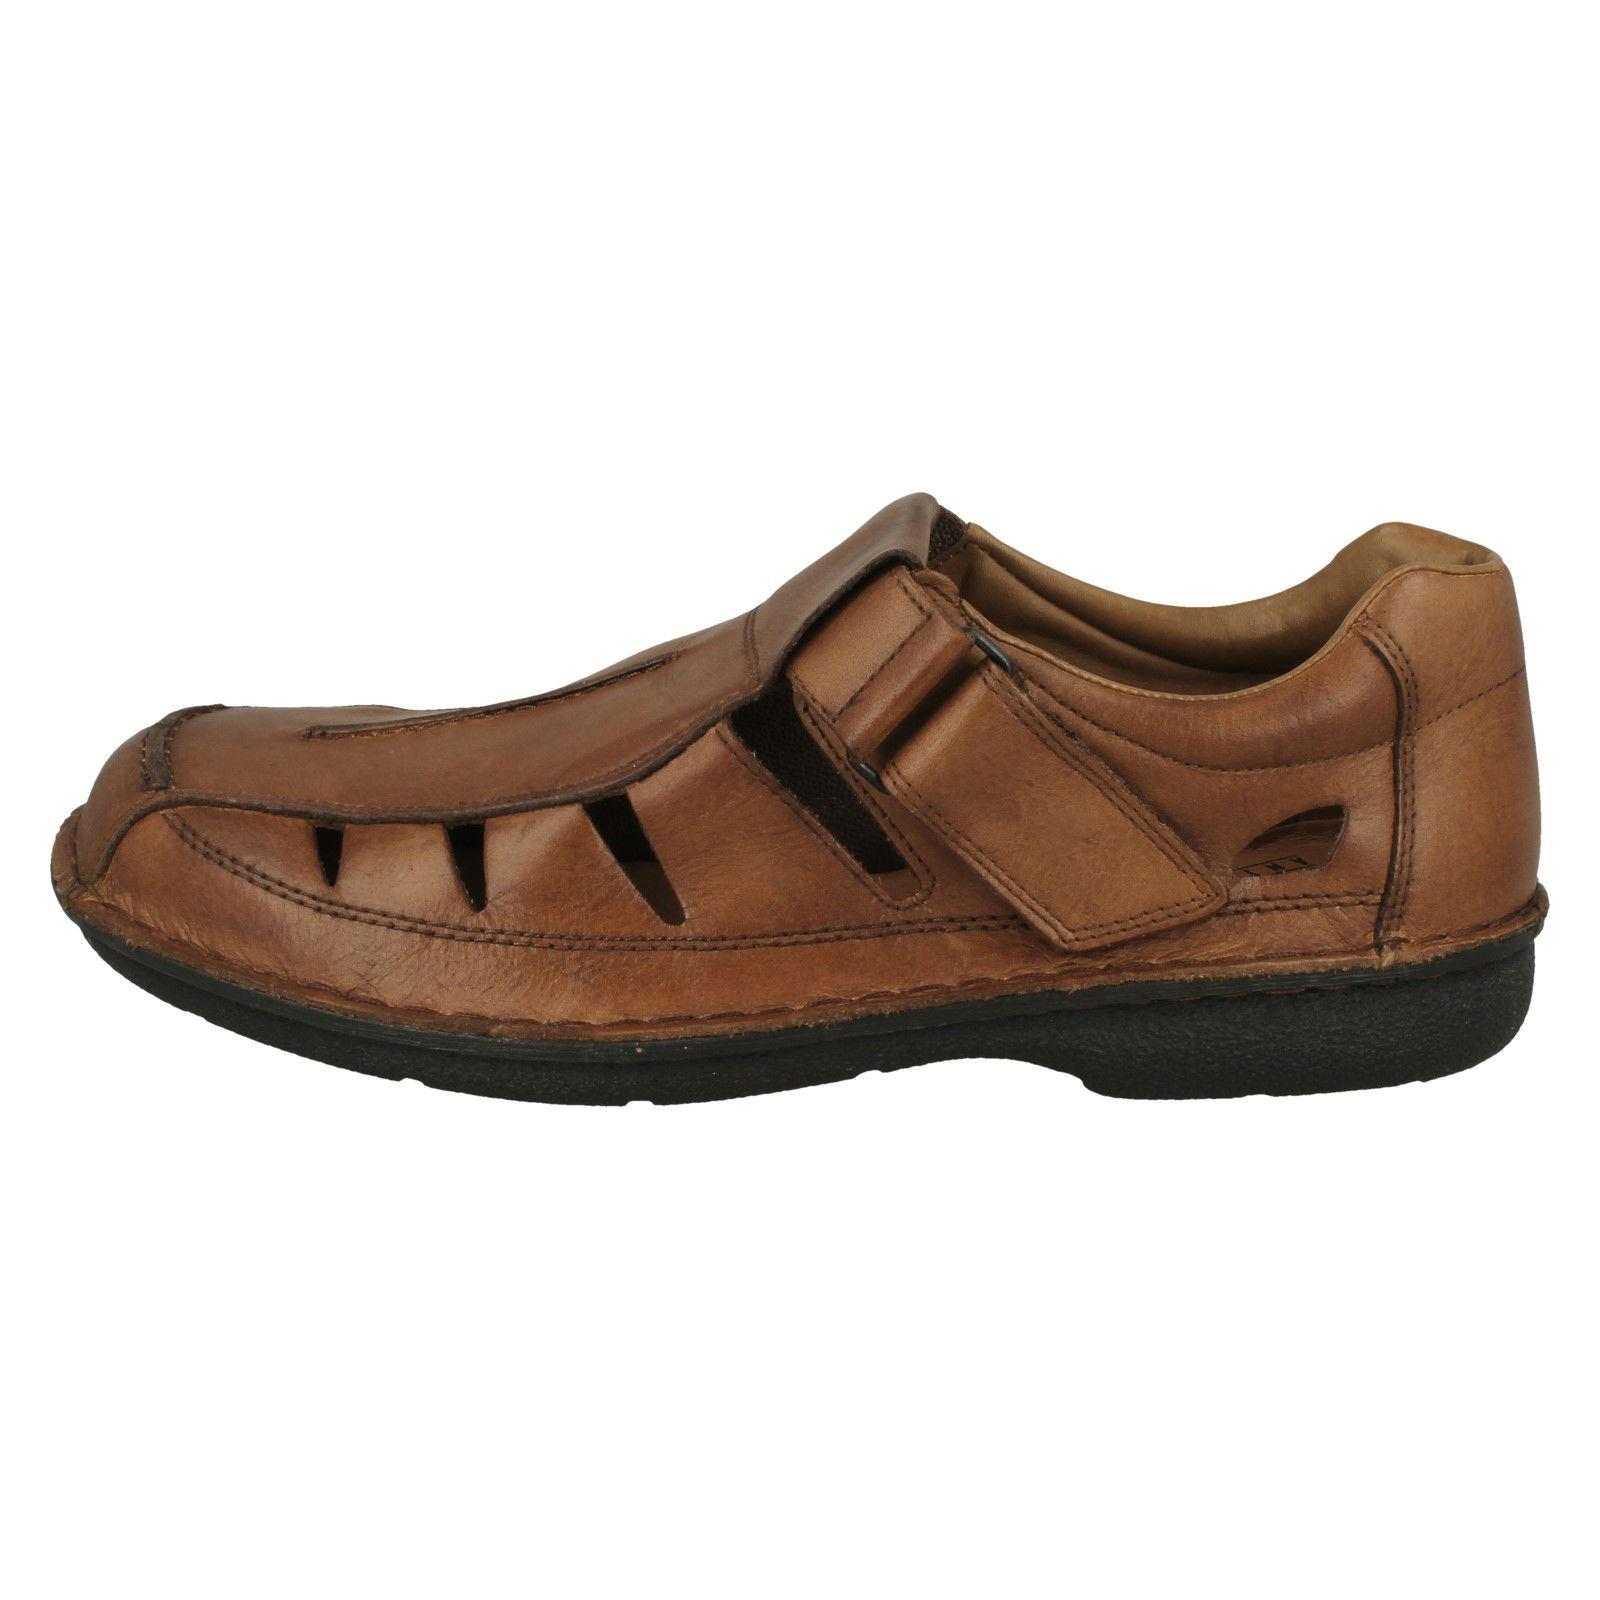 4abe431d3 Men s Closed Toe Sandals – Fashion dresses